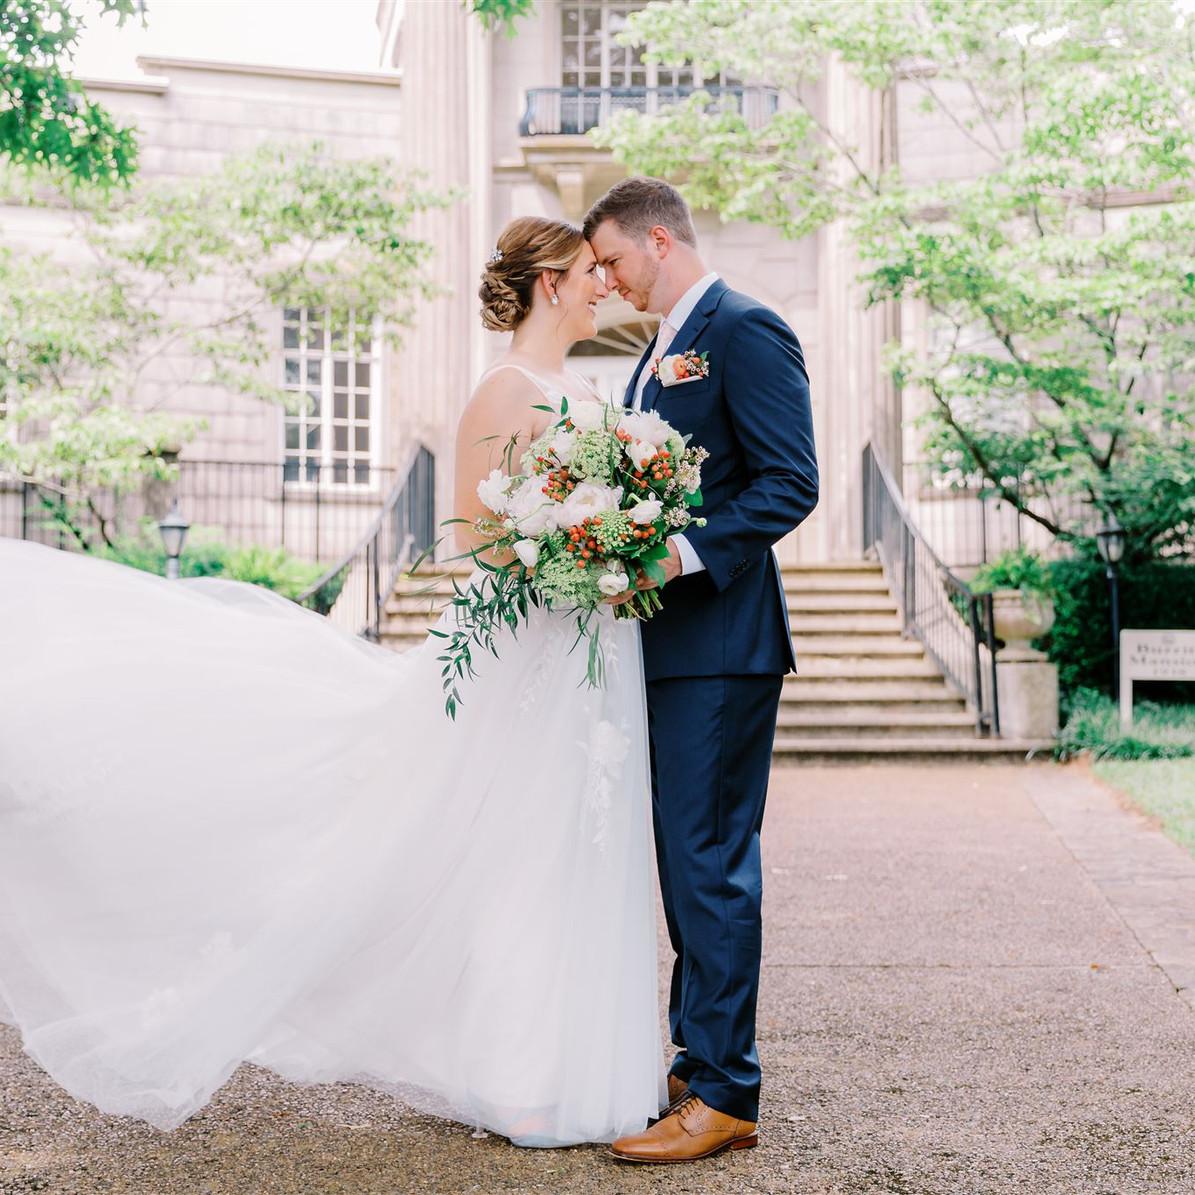 AisPortraits-Kate-Mitch-Wedding-140_websize.jpg